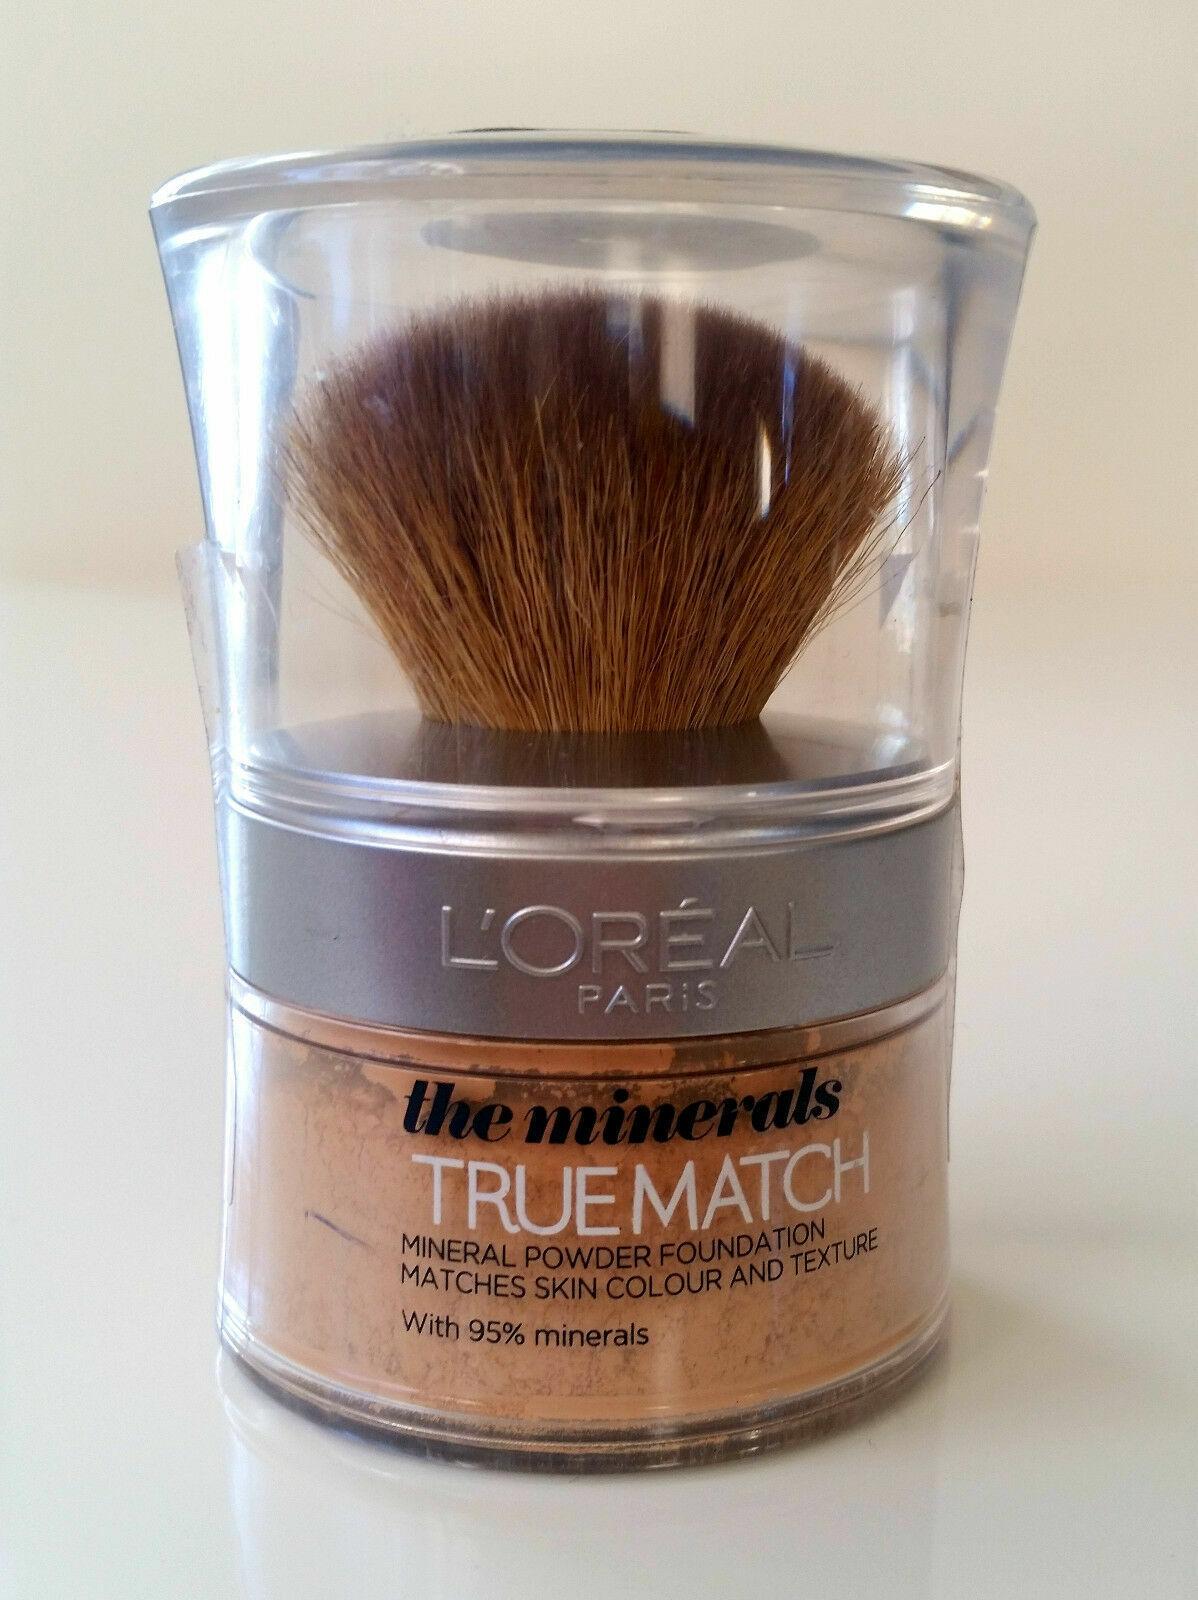 Loreal True Match Mineral Puder Foundation N3 Beige Creme / Creamy Beige